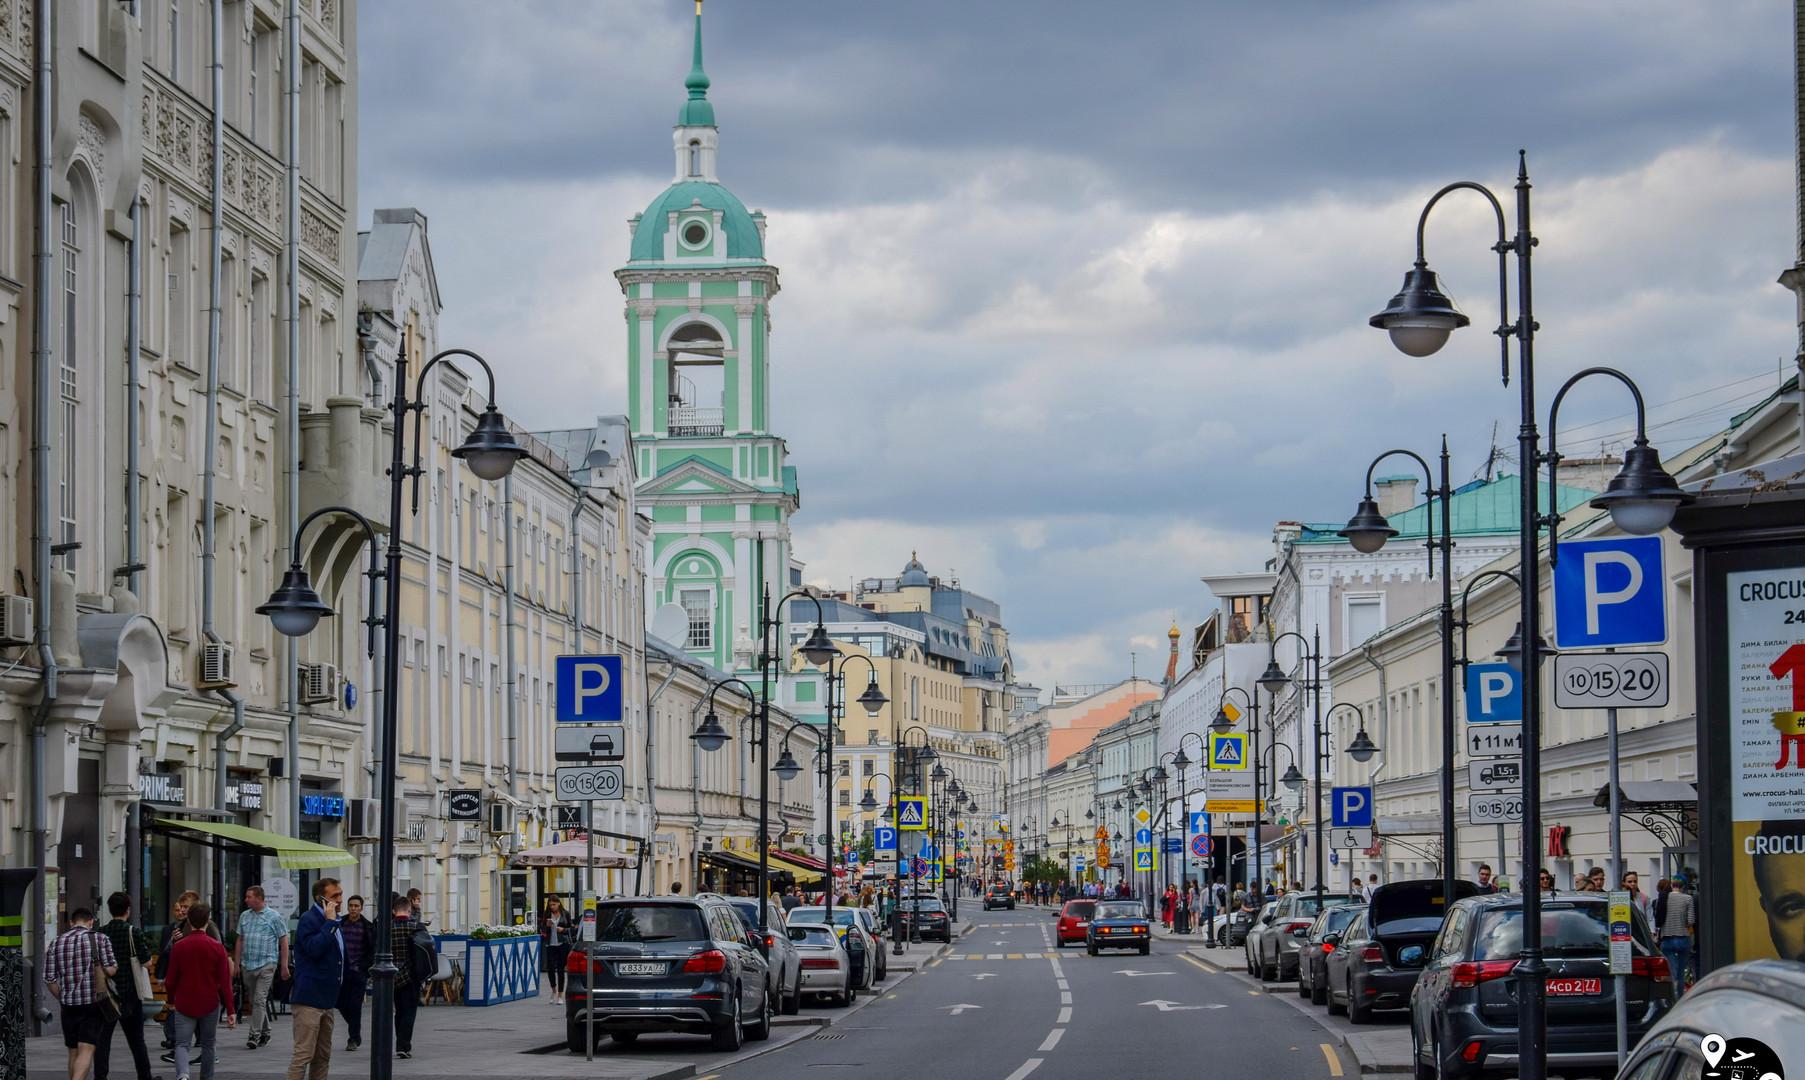 Пятницкая улица, Москва